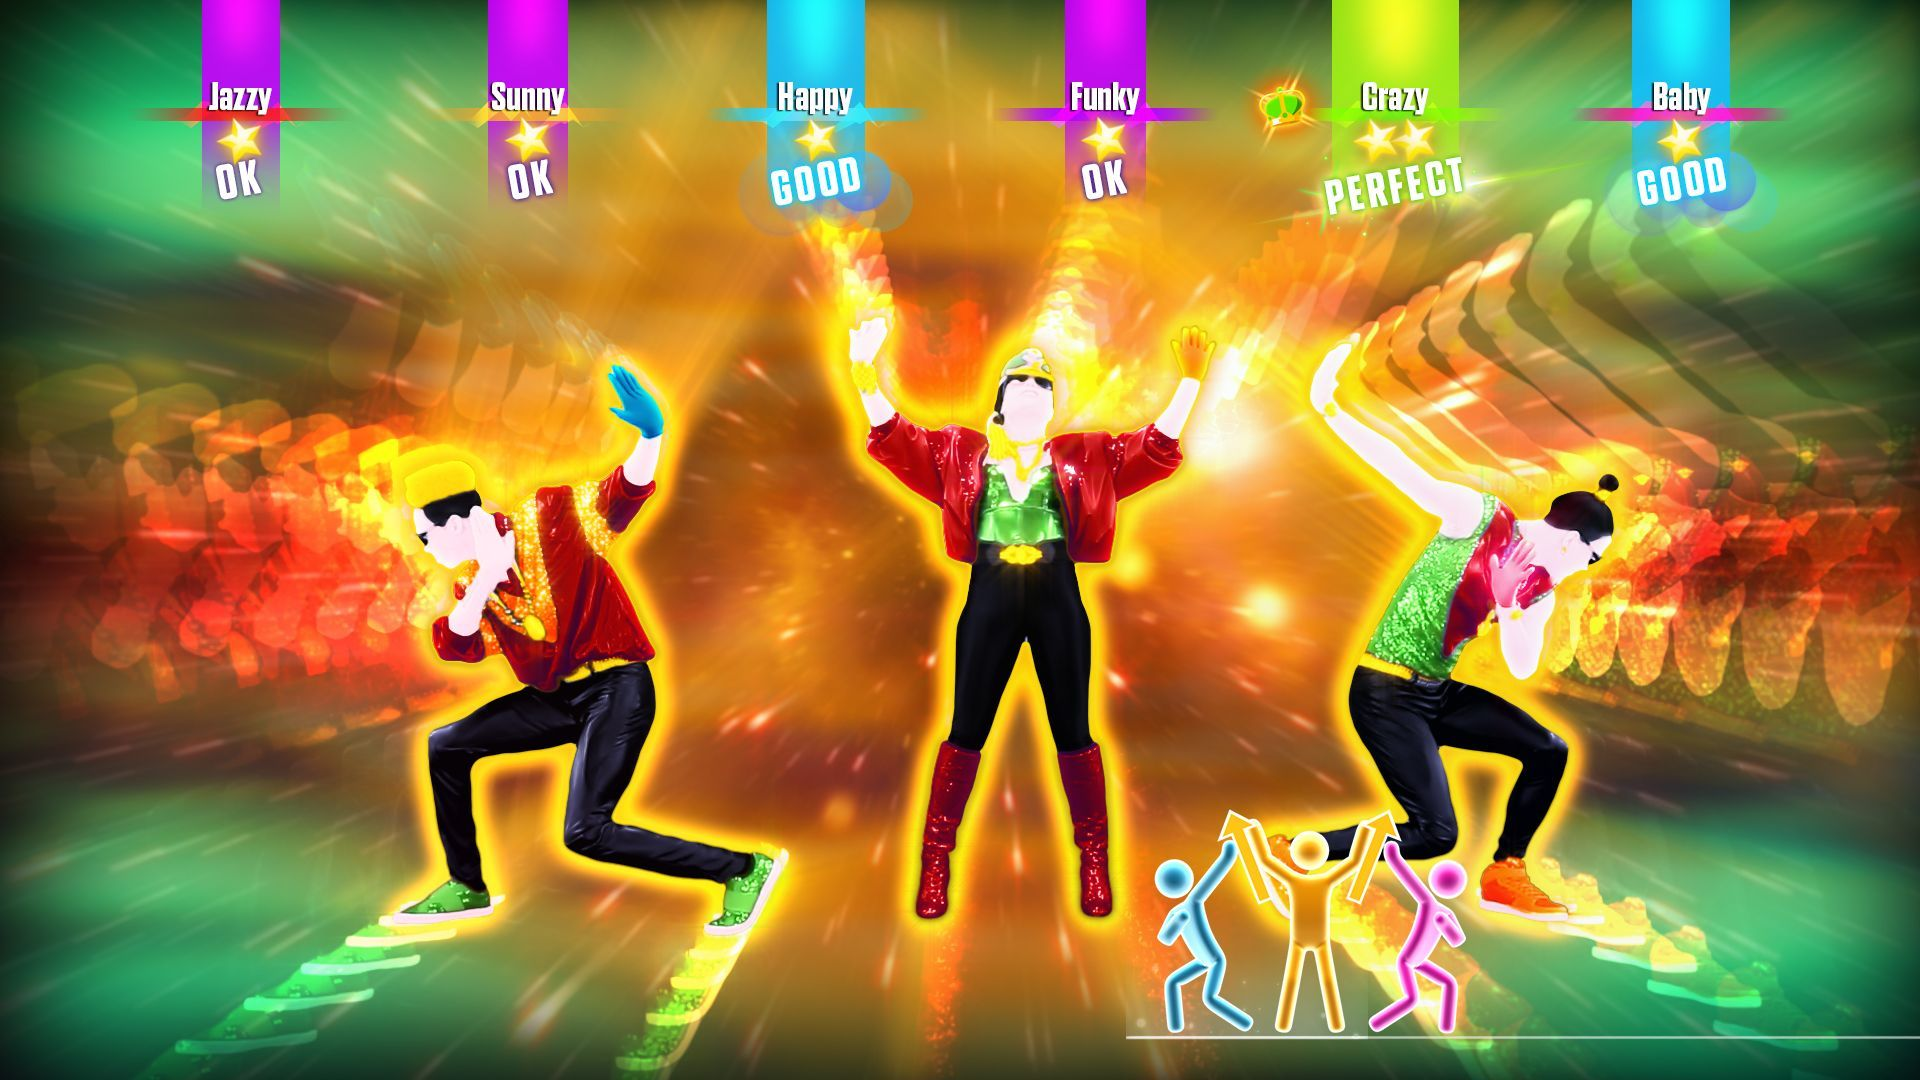 Just Dance 2017 (Nintendo Switch) - 9